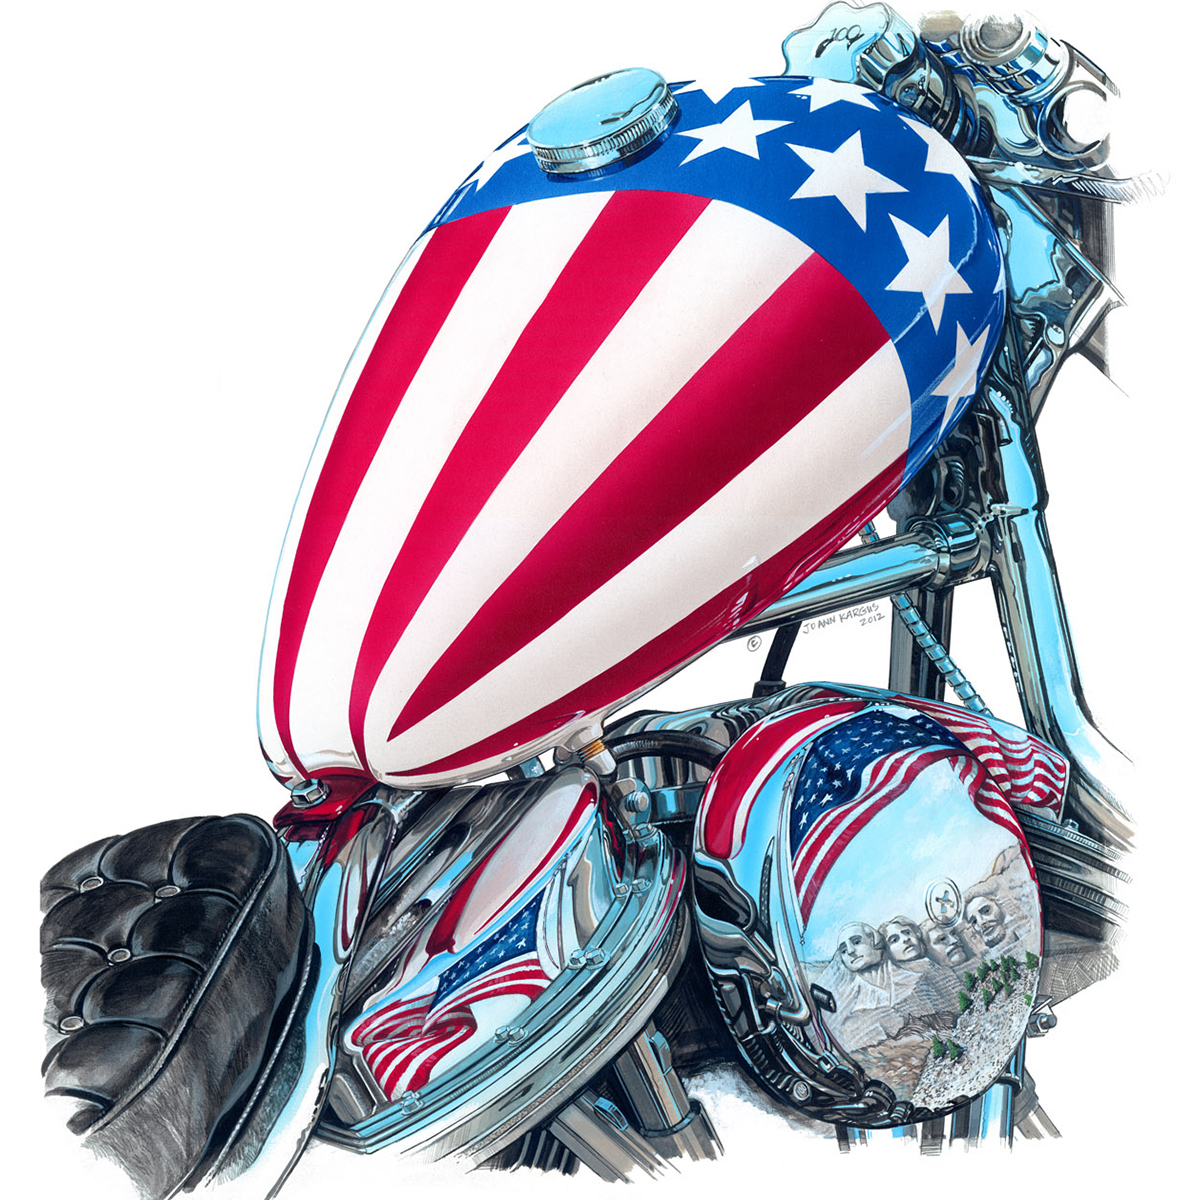 14-capt-america-airbrush